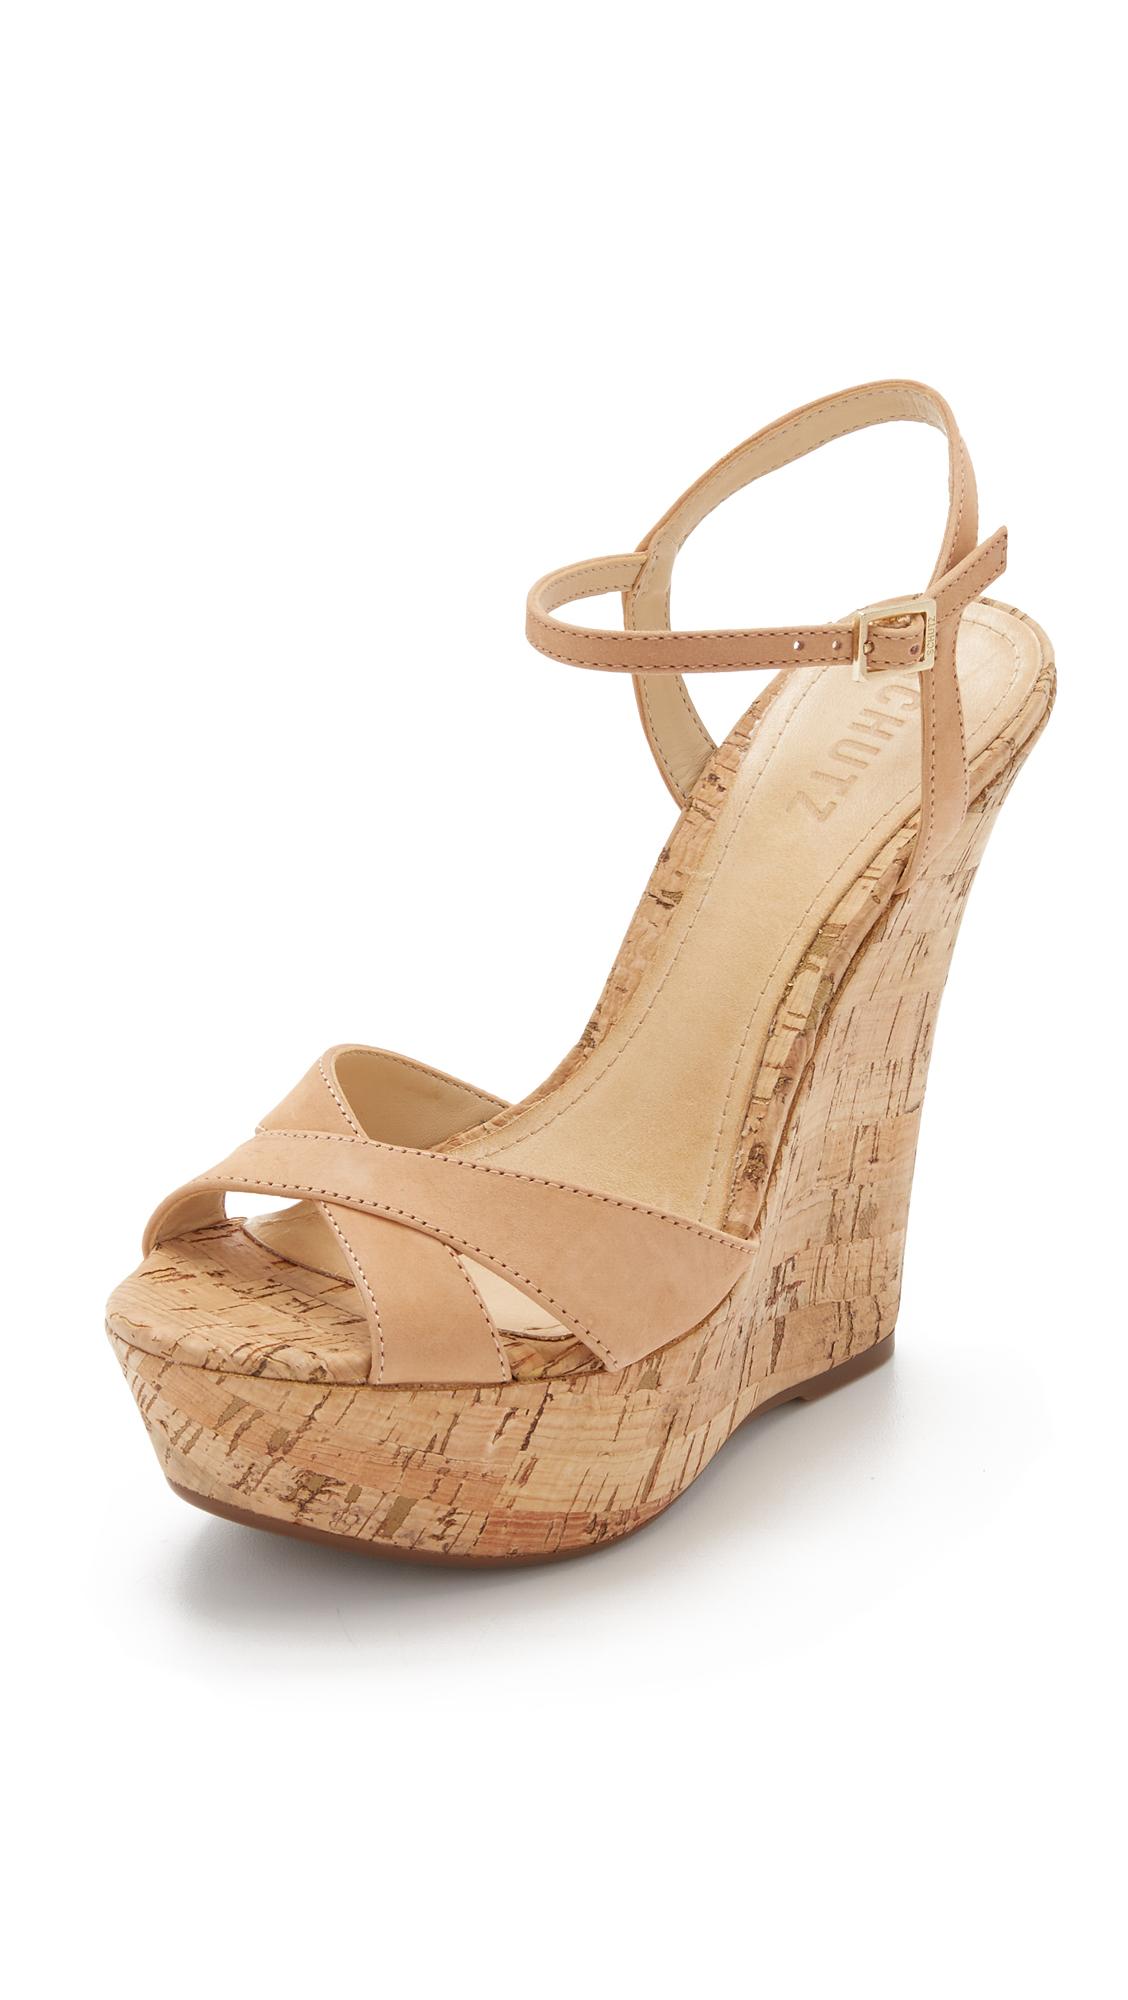 1cde7618867 Lyst - Schutz Emiliana Wedge Sandals in Brown